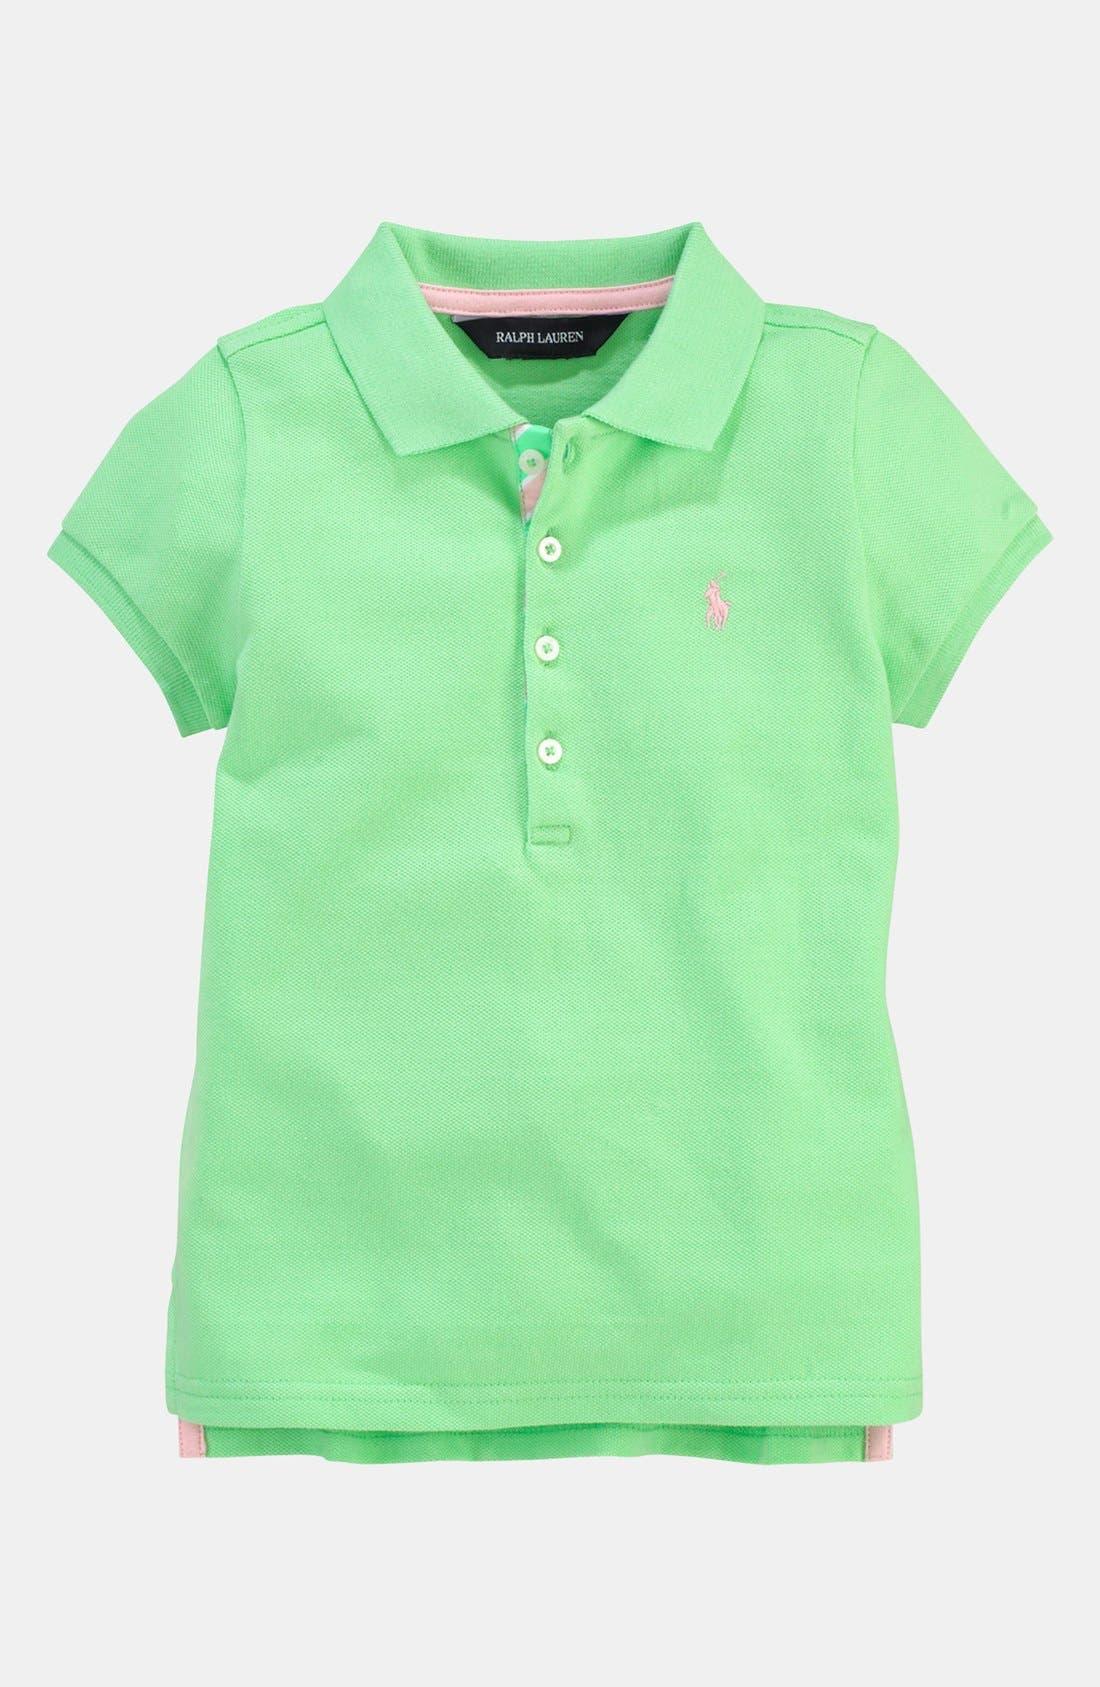 Alternate Image 1 Selected - Ralph Lauren Polo Shirt (Toddler)